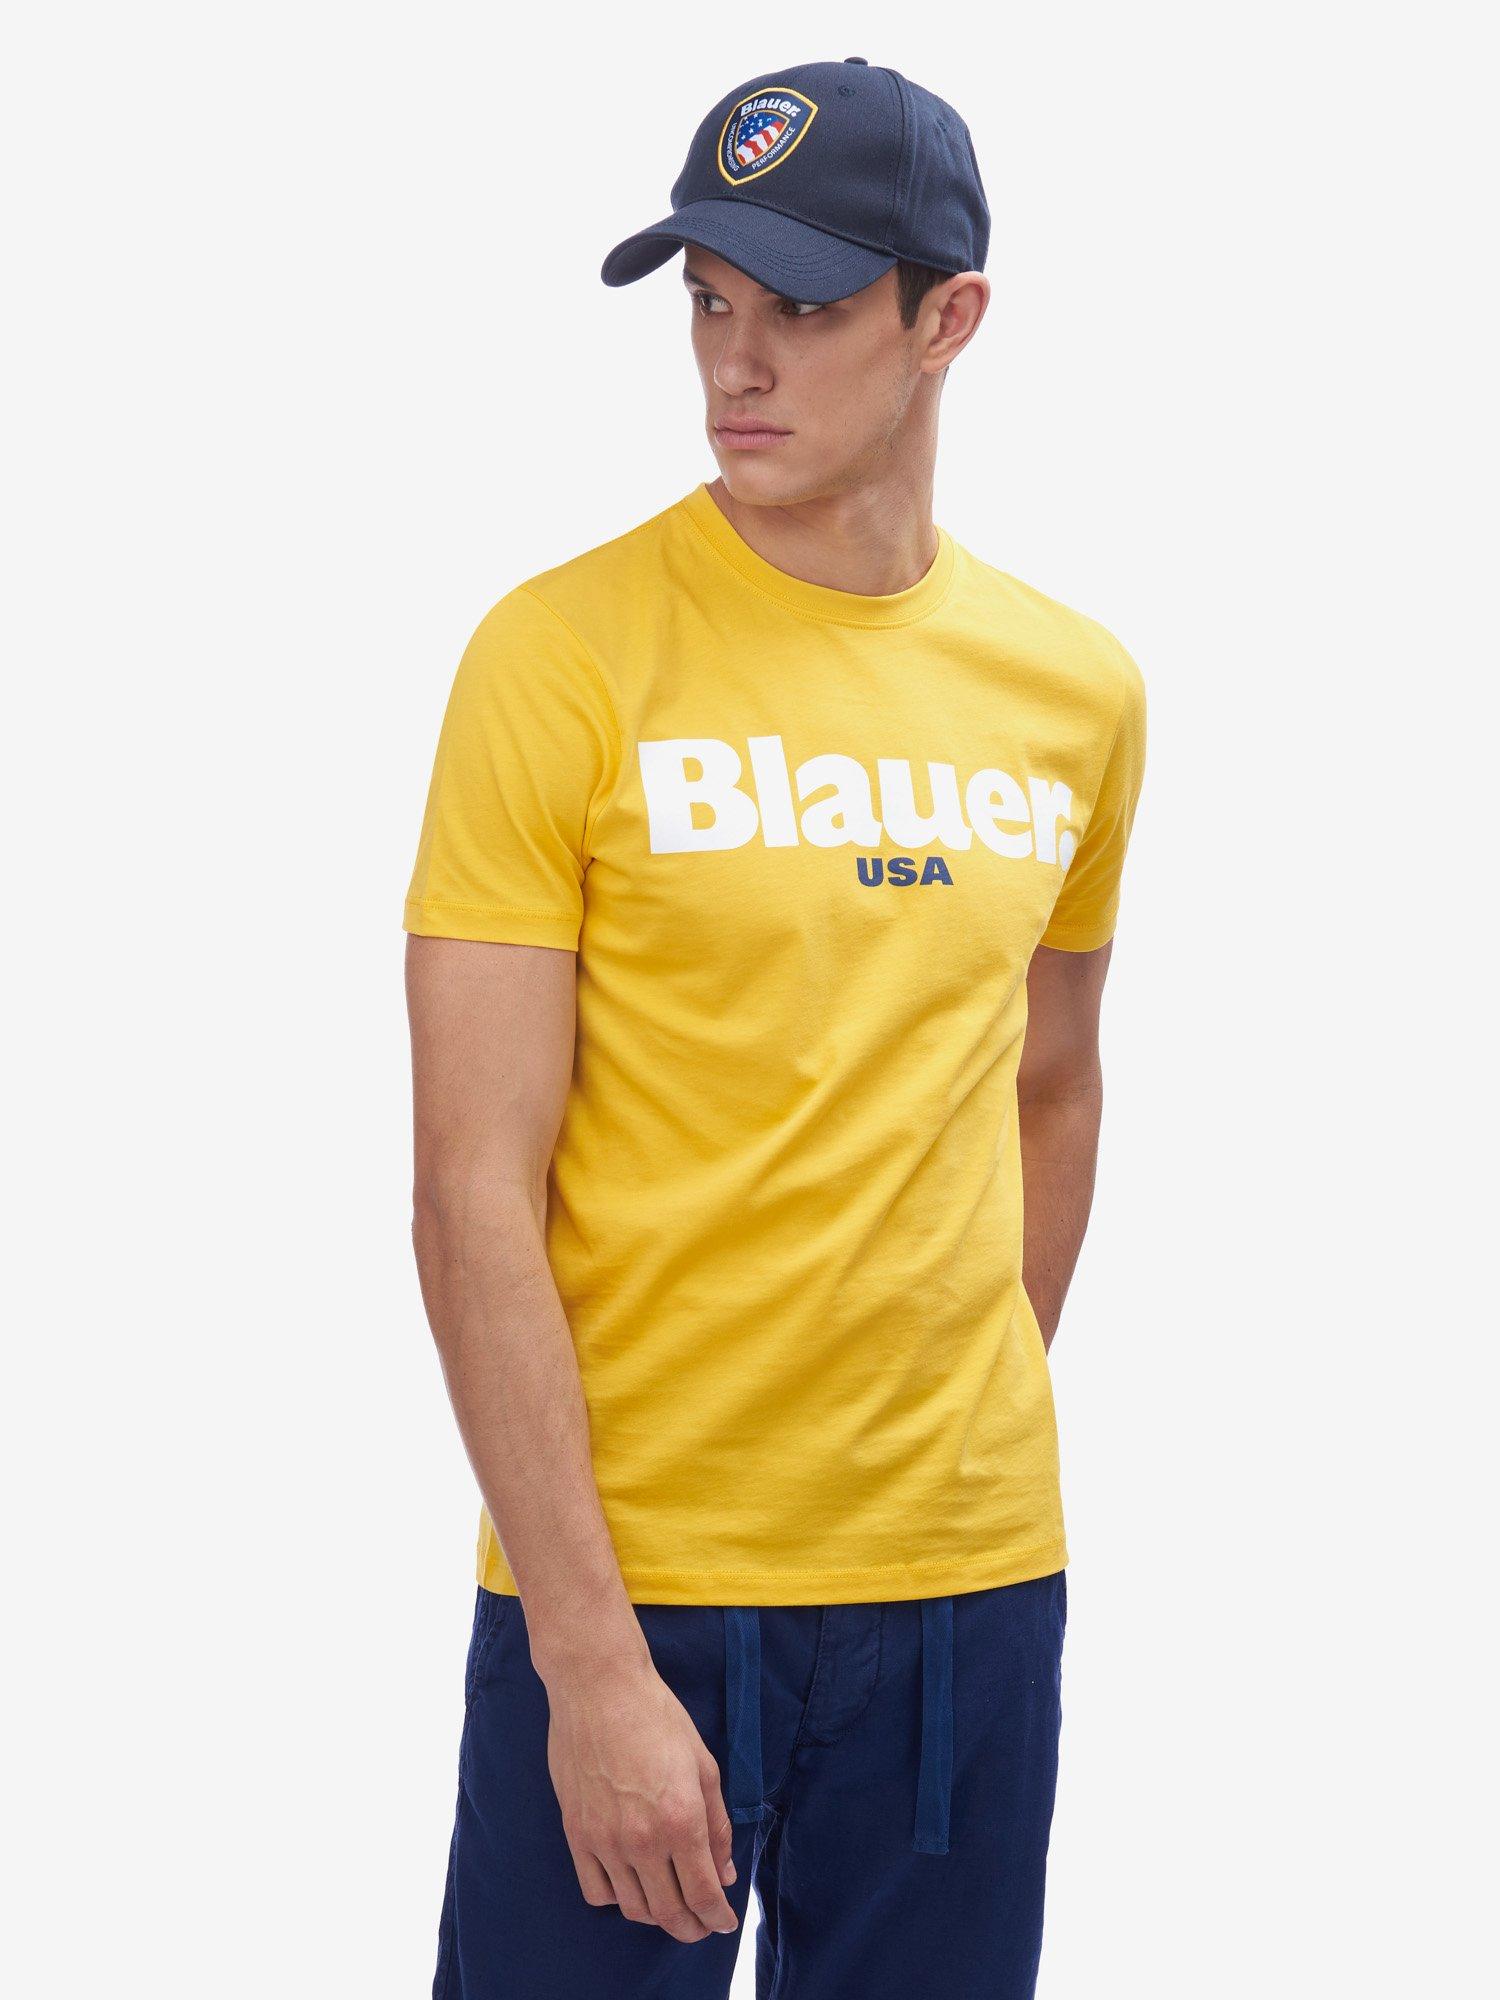 Blauer - BLAUER USA T-SHIRT - Canary - Blauer